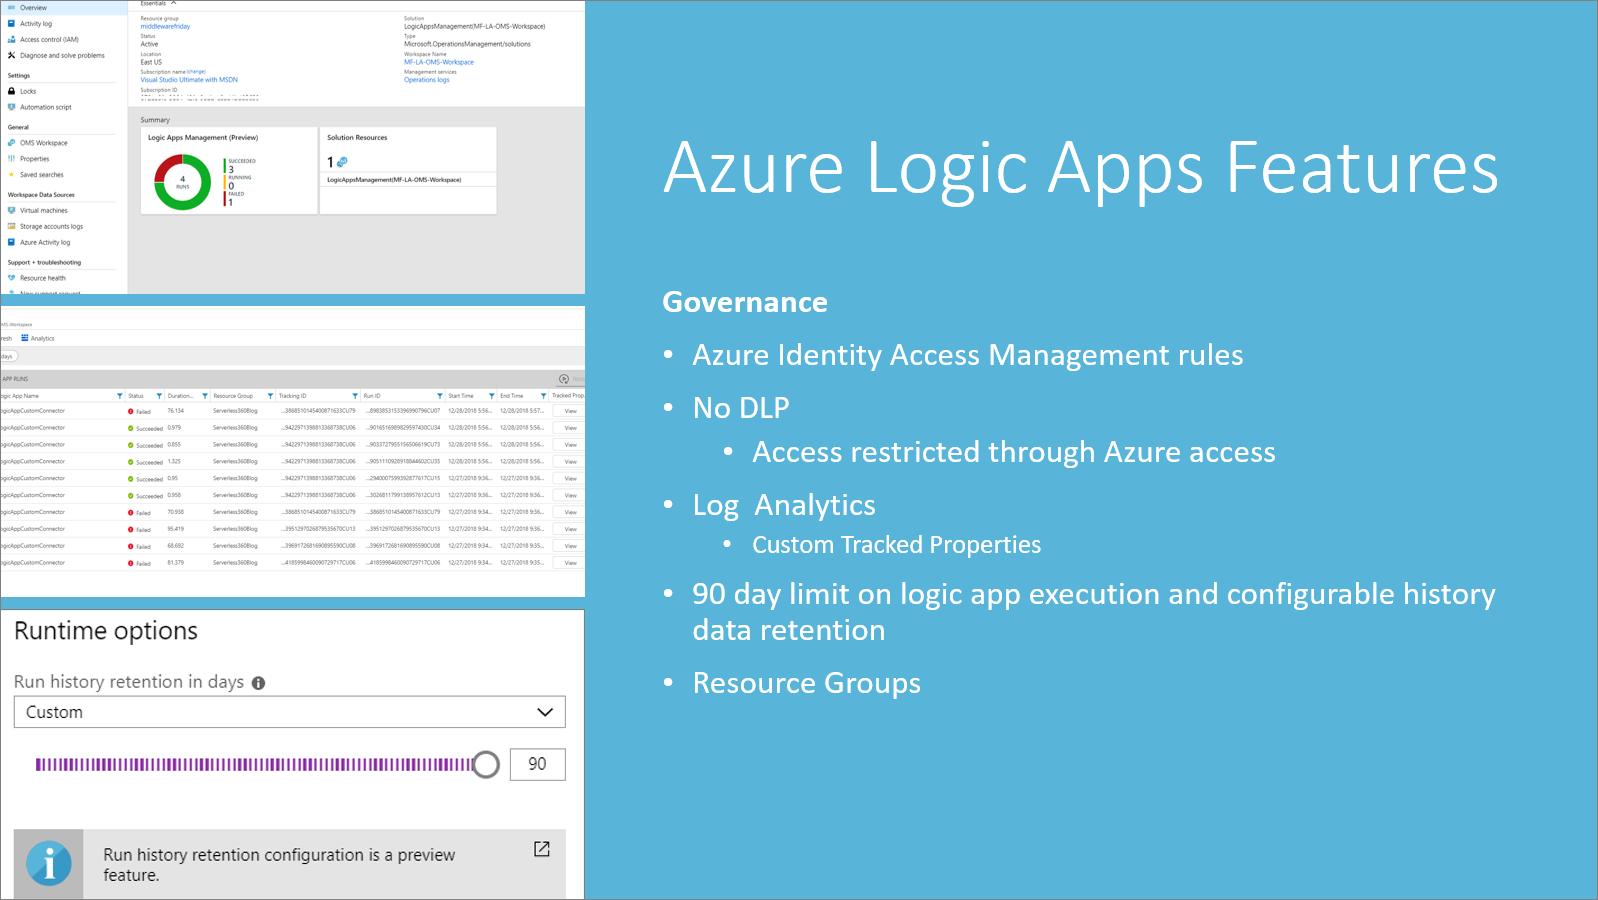 Azure Logic Apps governance